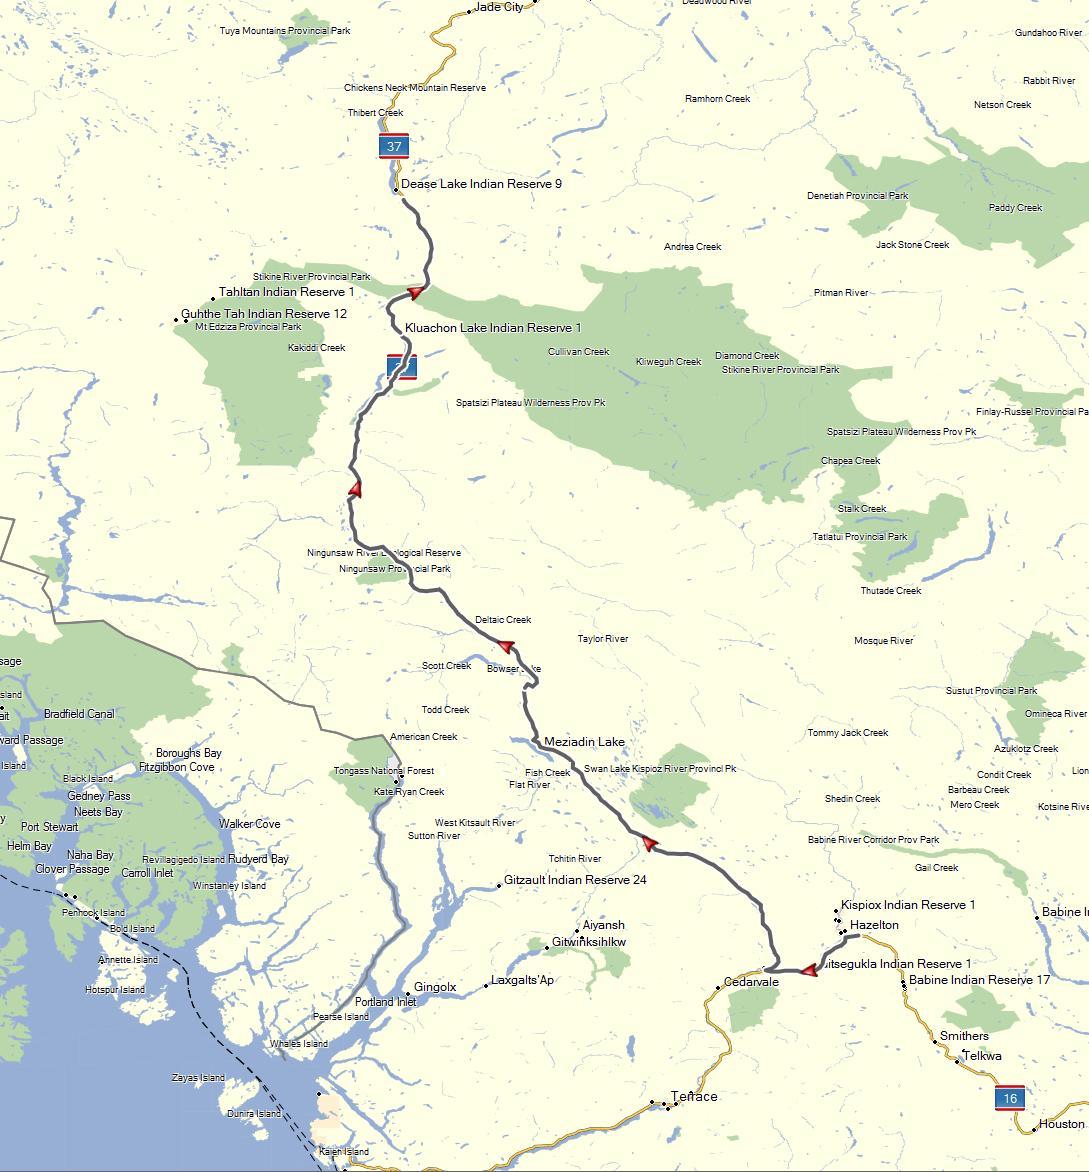 dease lake bc map New Hazelton Bc To Dease Lake Bc August 9 2015 Don Moe S dease lake bc map